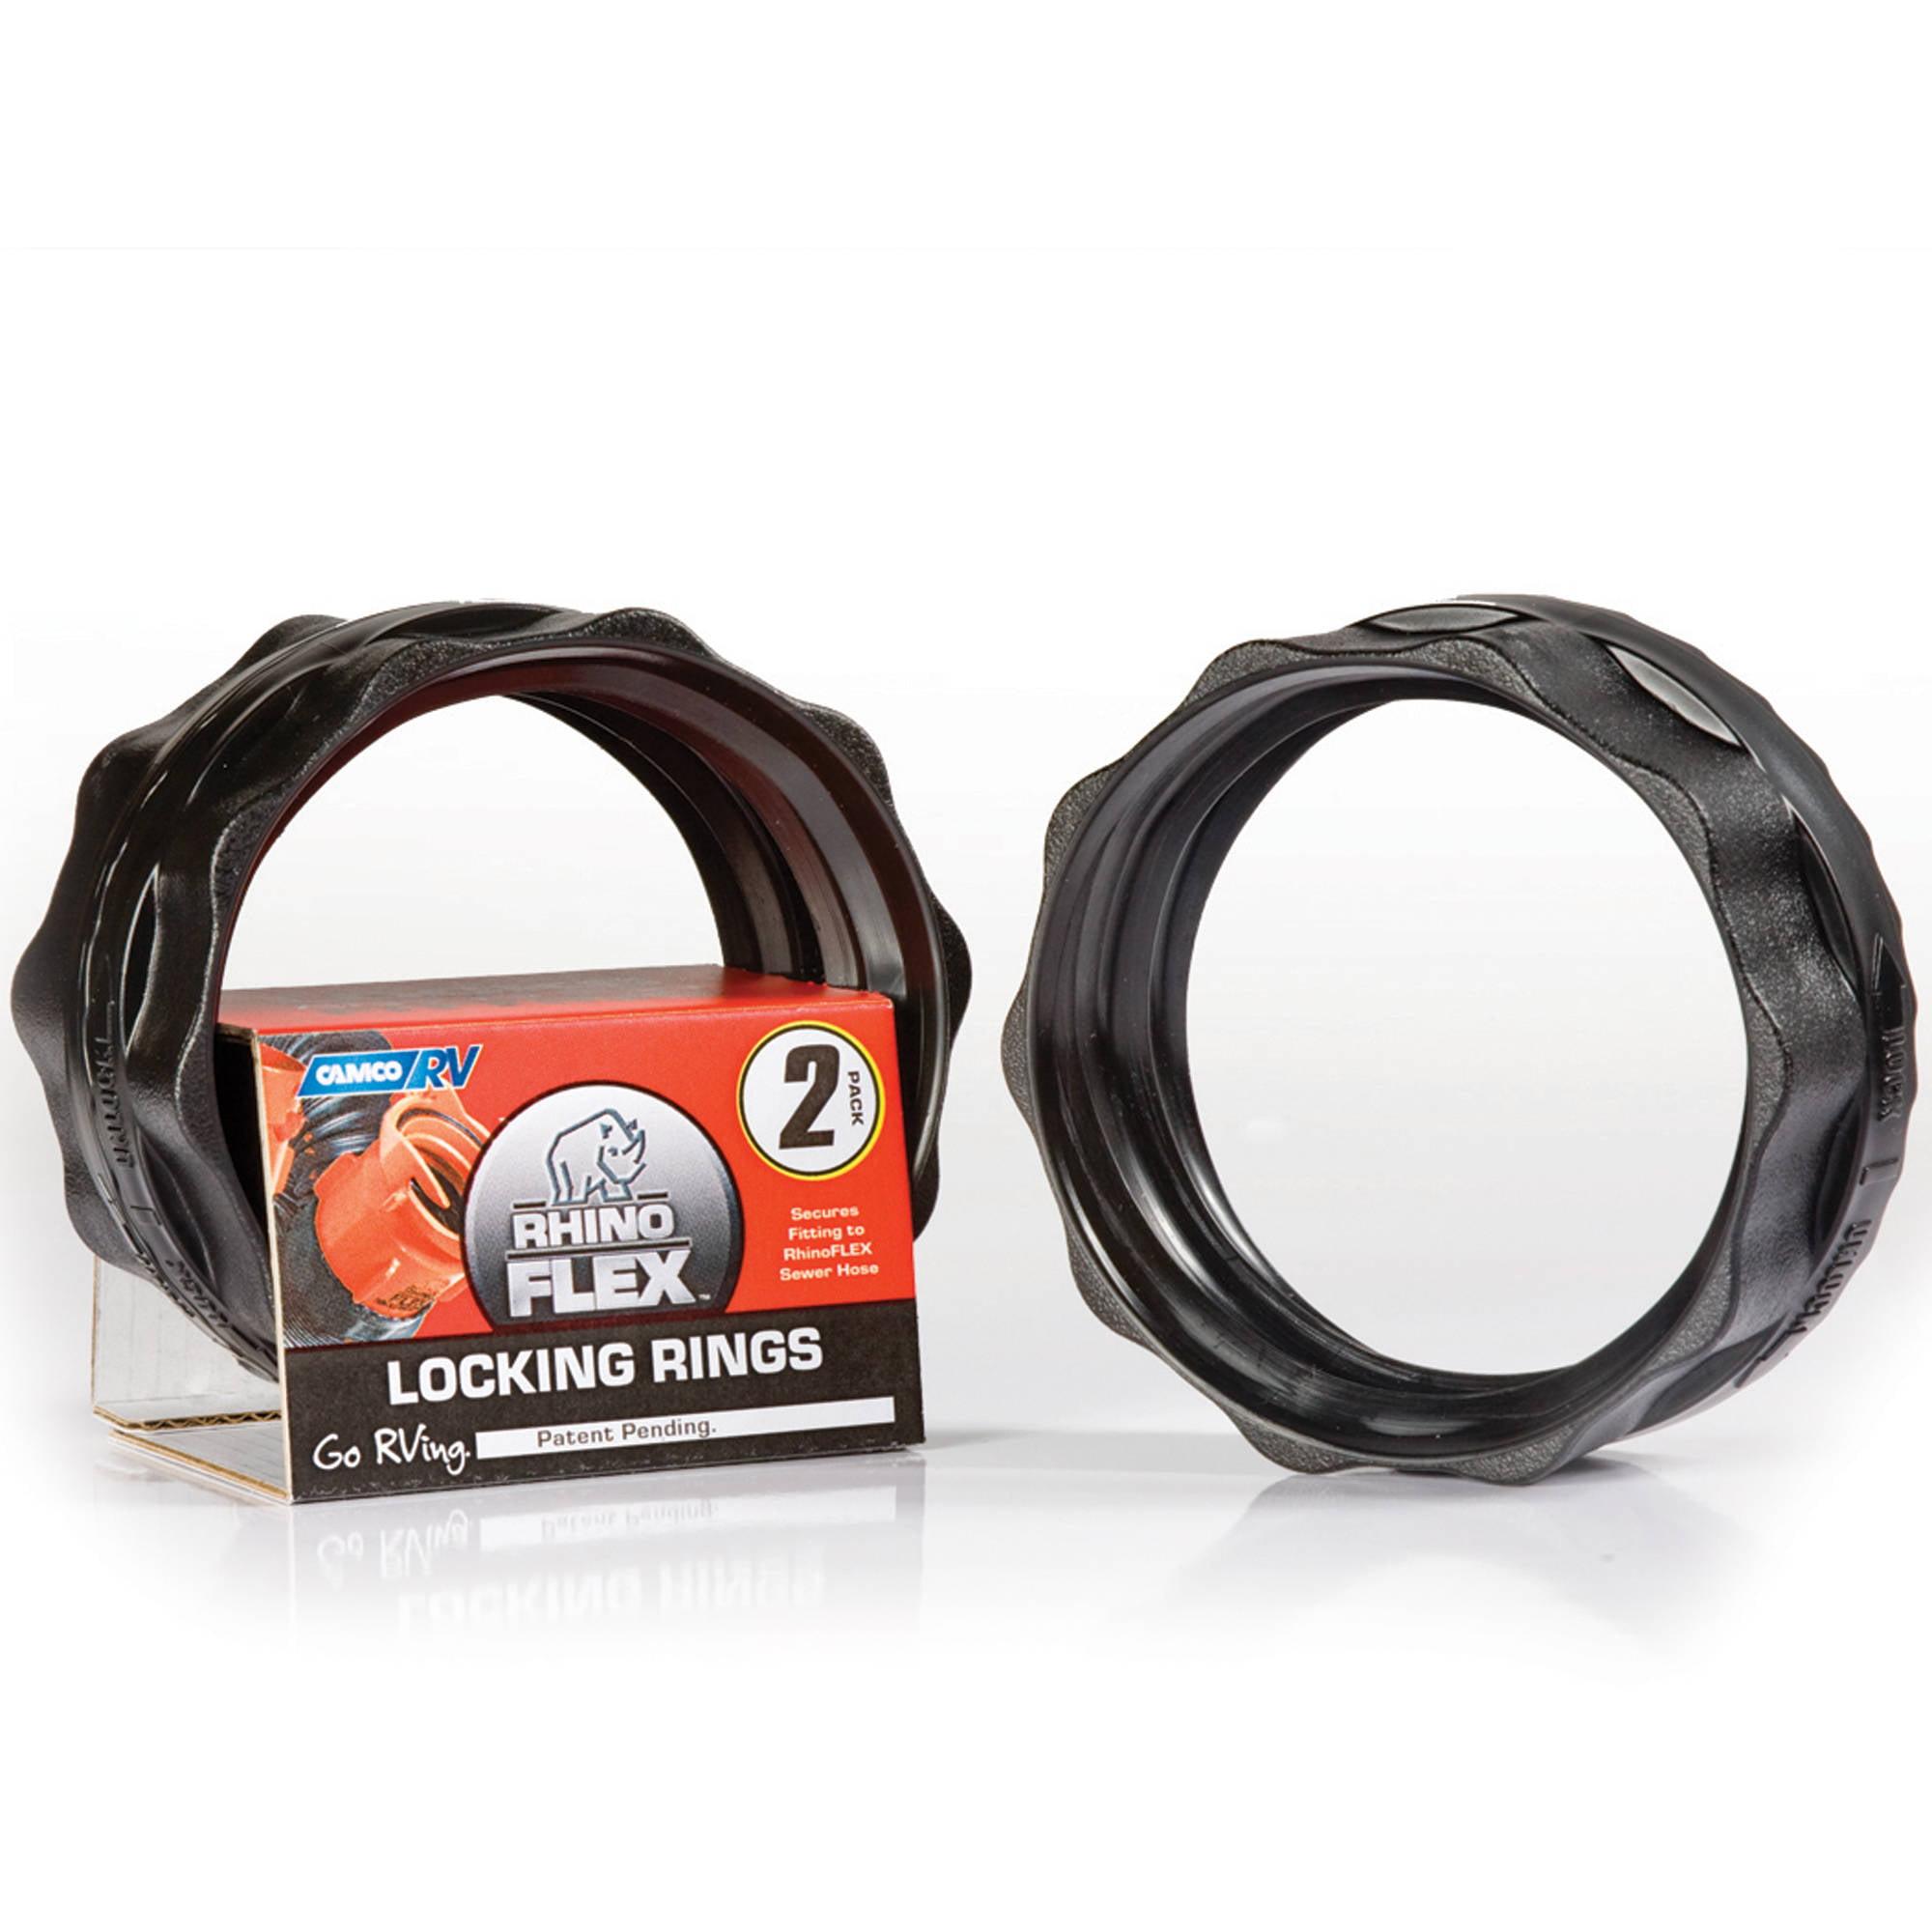 Camco 39803 RhinoFLEX Locking Ring